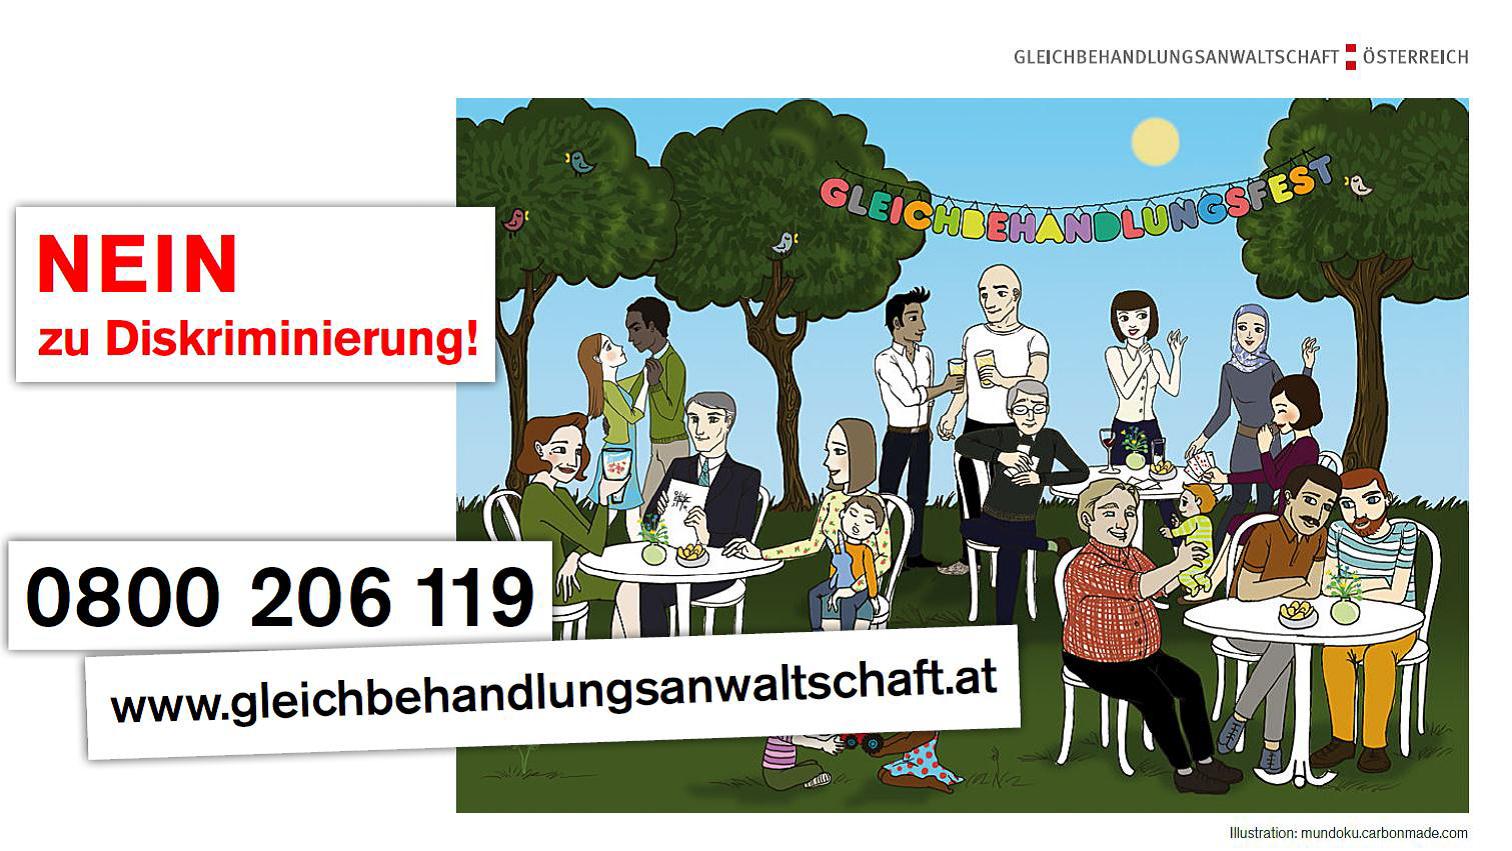 austria_antidiscrimination_campaign.png